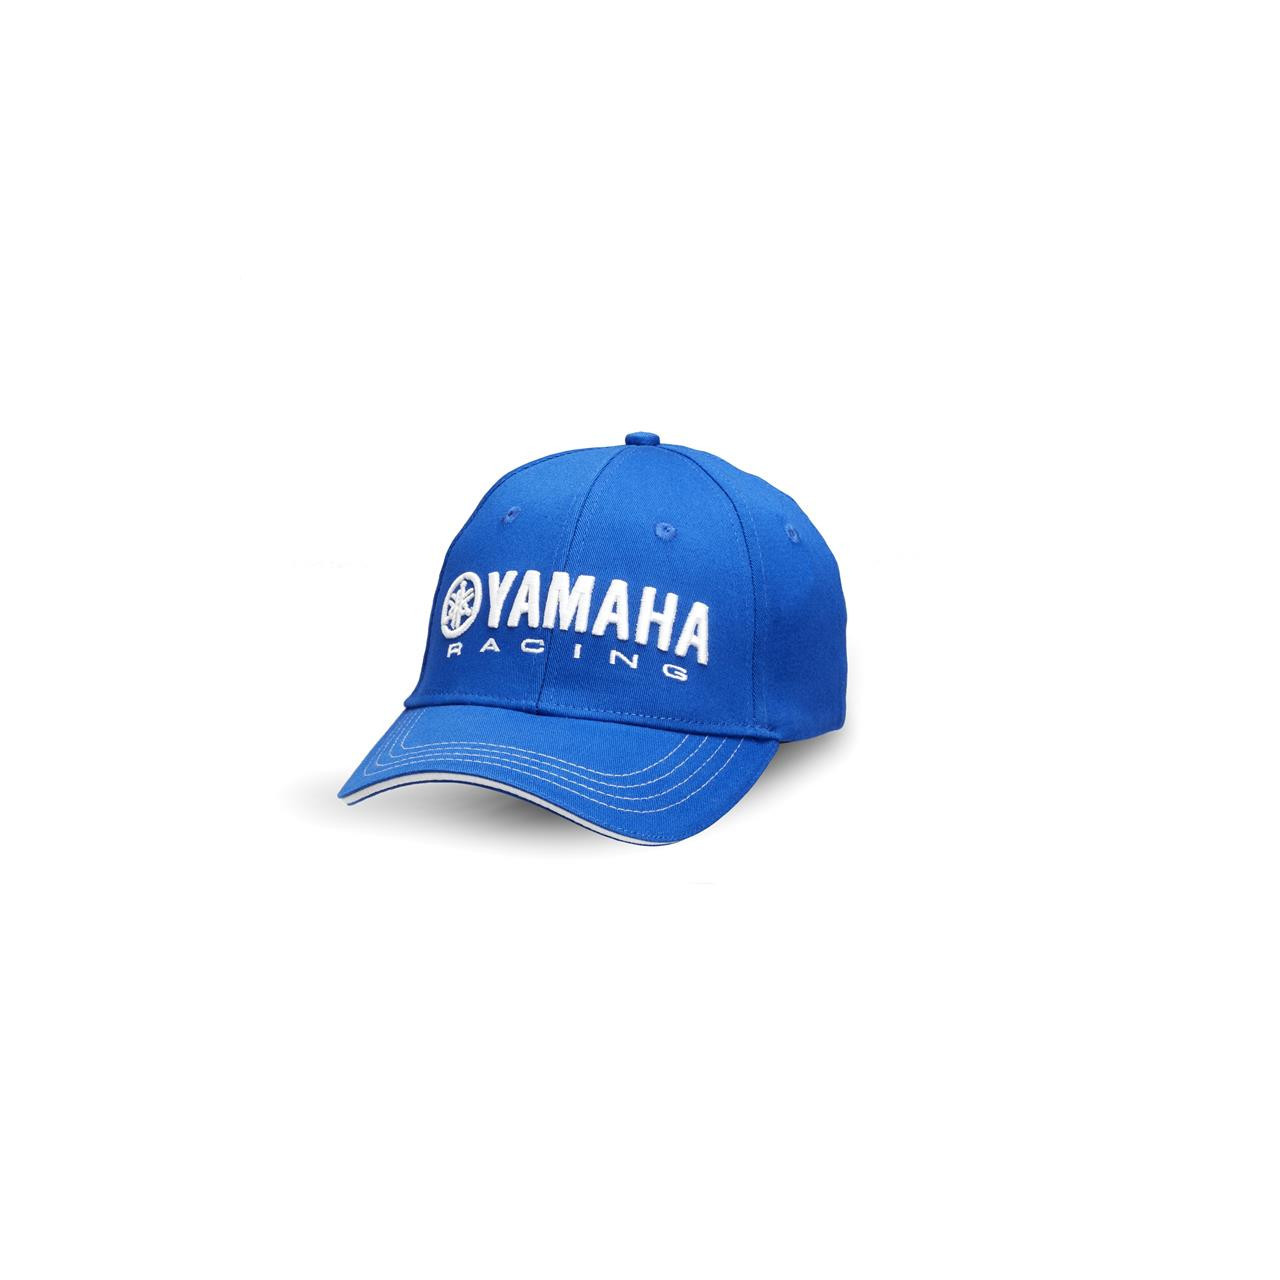 YAMAHA Casquette Casual Paddock Bleu 2018